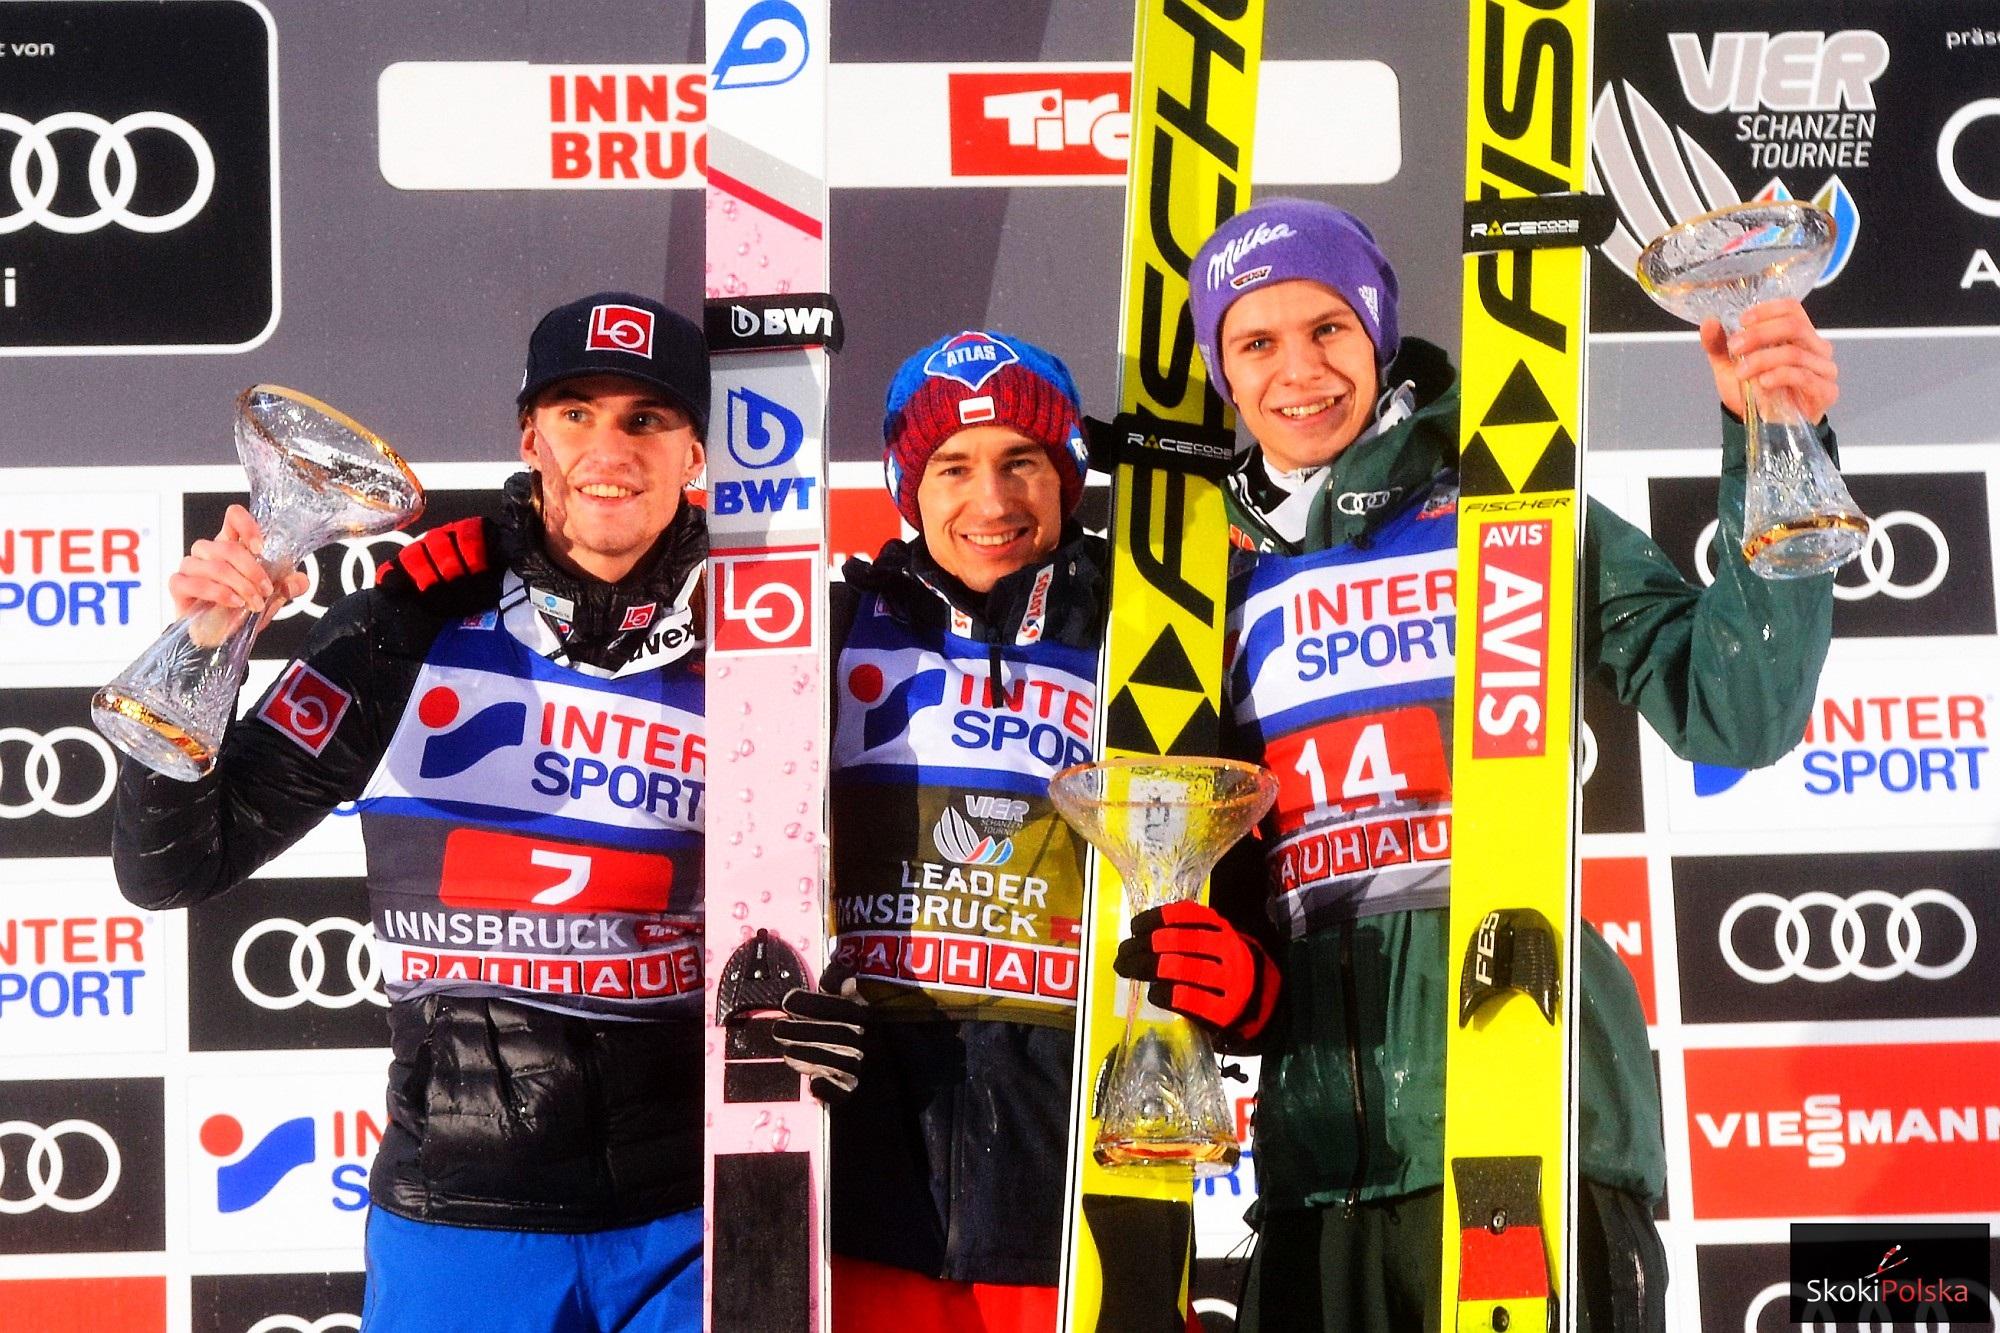 Kamil Stoch wygrywa w Innsbrucku, obok niego na podium Daniel-Andre Tande i Andreas Wellinger (fot. Julia Piątkowska)